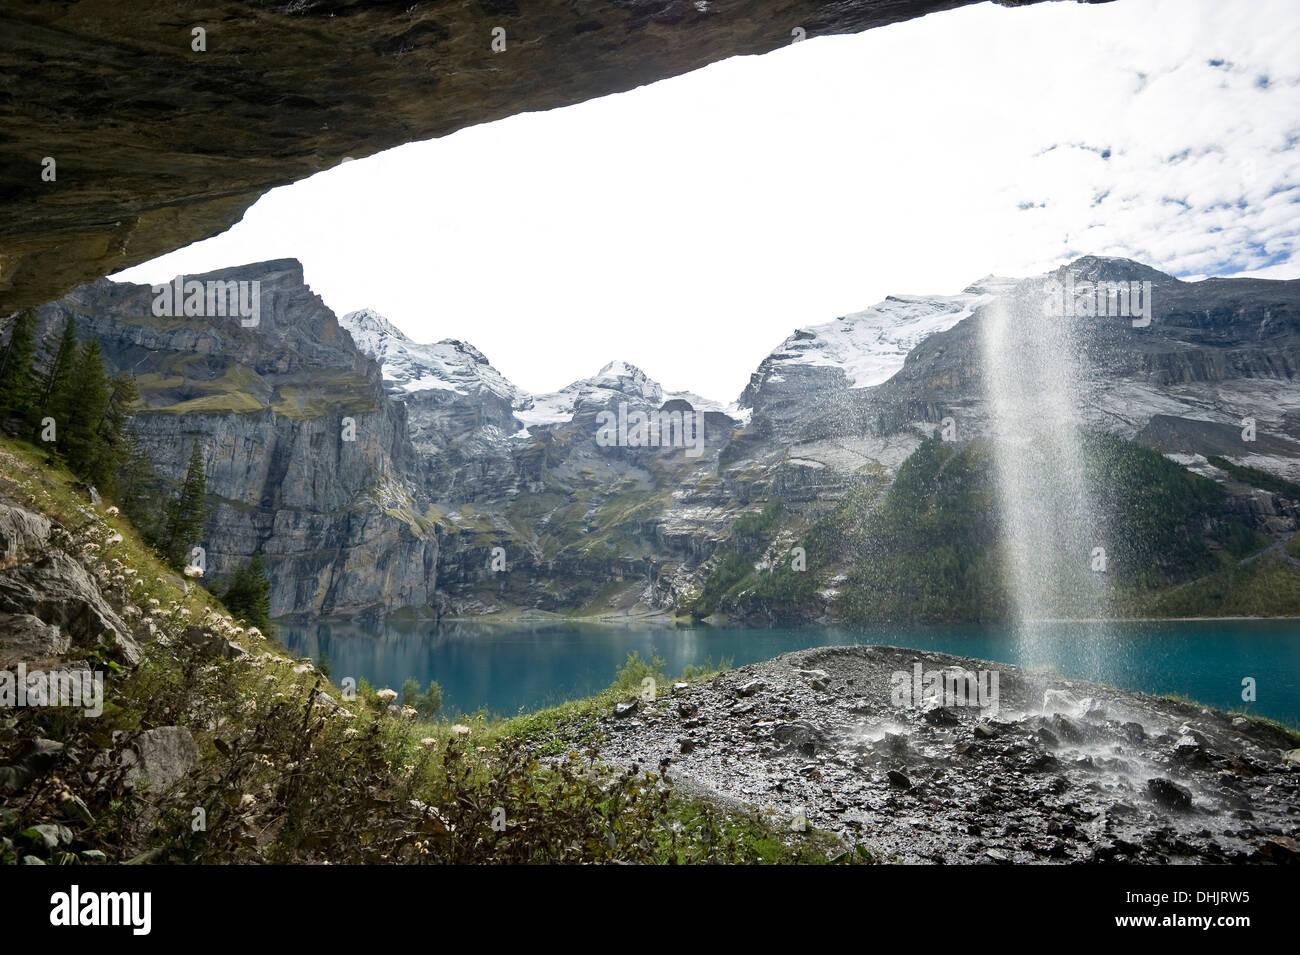 cascade and sun, Oeschinen Lake, Kandersteg, Bernese Oberland, Canton of Bern, Switzerland, Europe - Stock Image